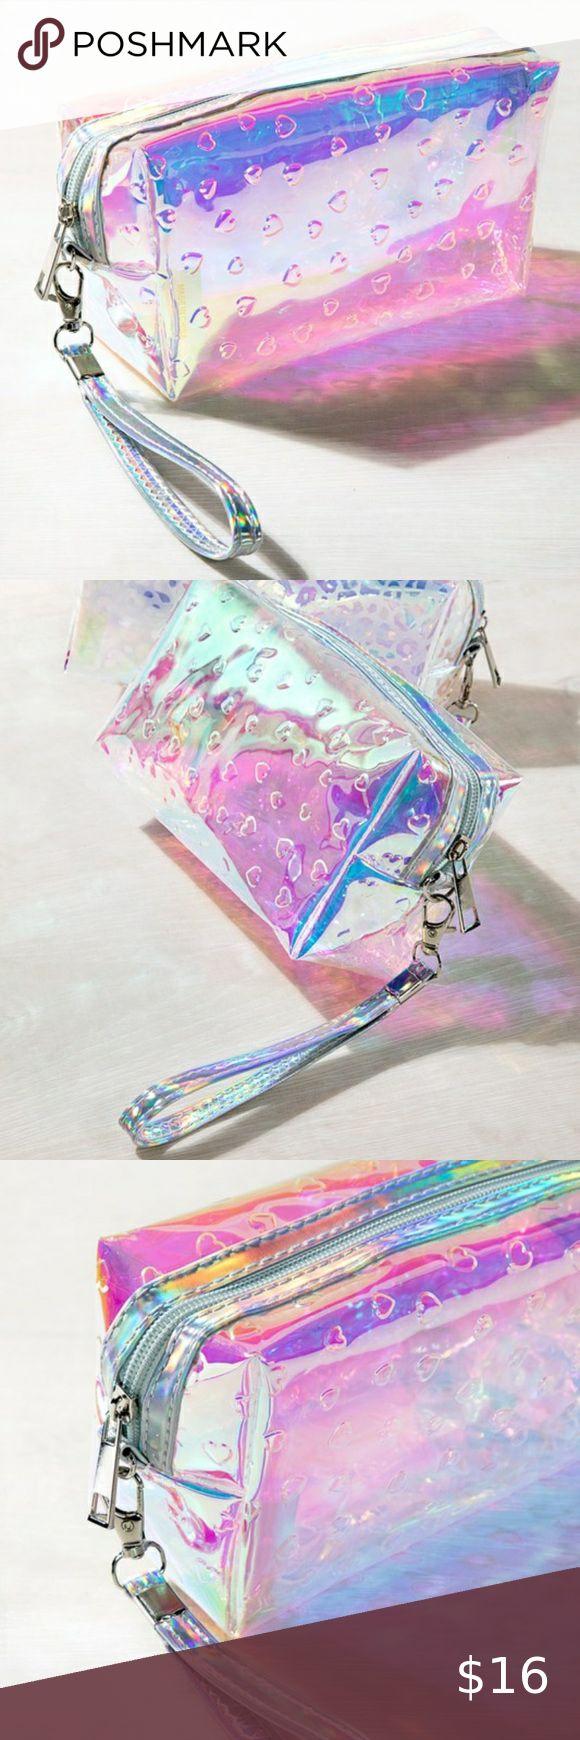 Iridescent Heart Makeup Bag New boutique item! Iridescent